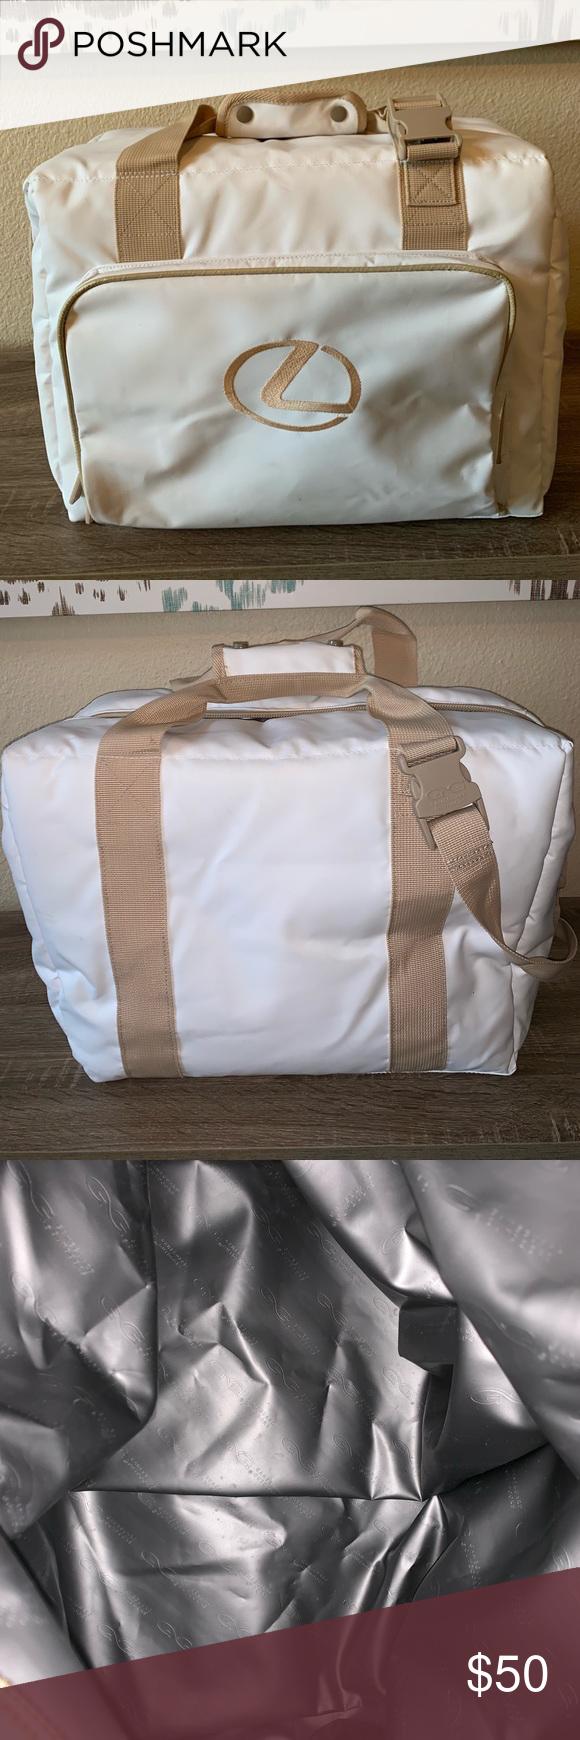 Gameguard Cooler Bag With Lexus Monogram Cooler Bag Bags Monogram